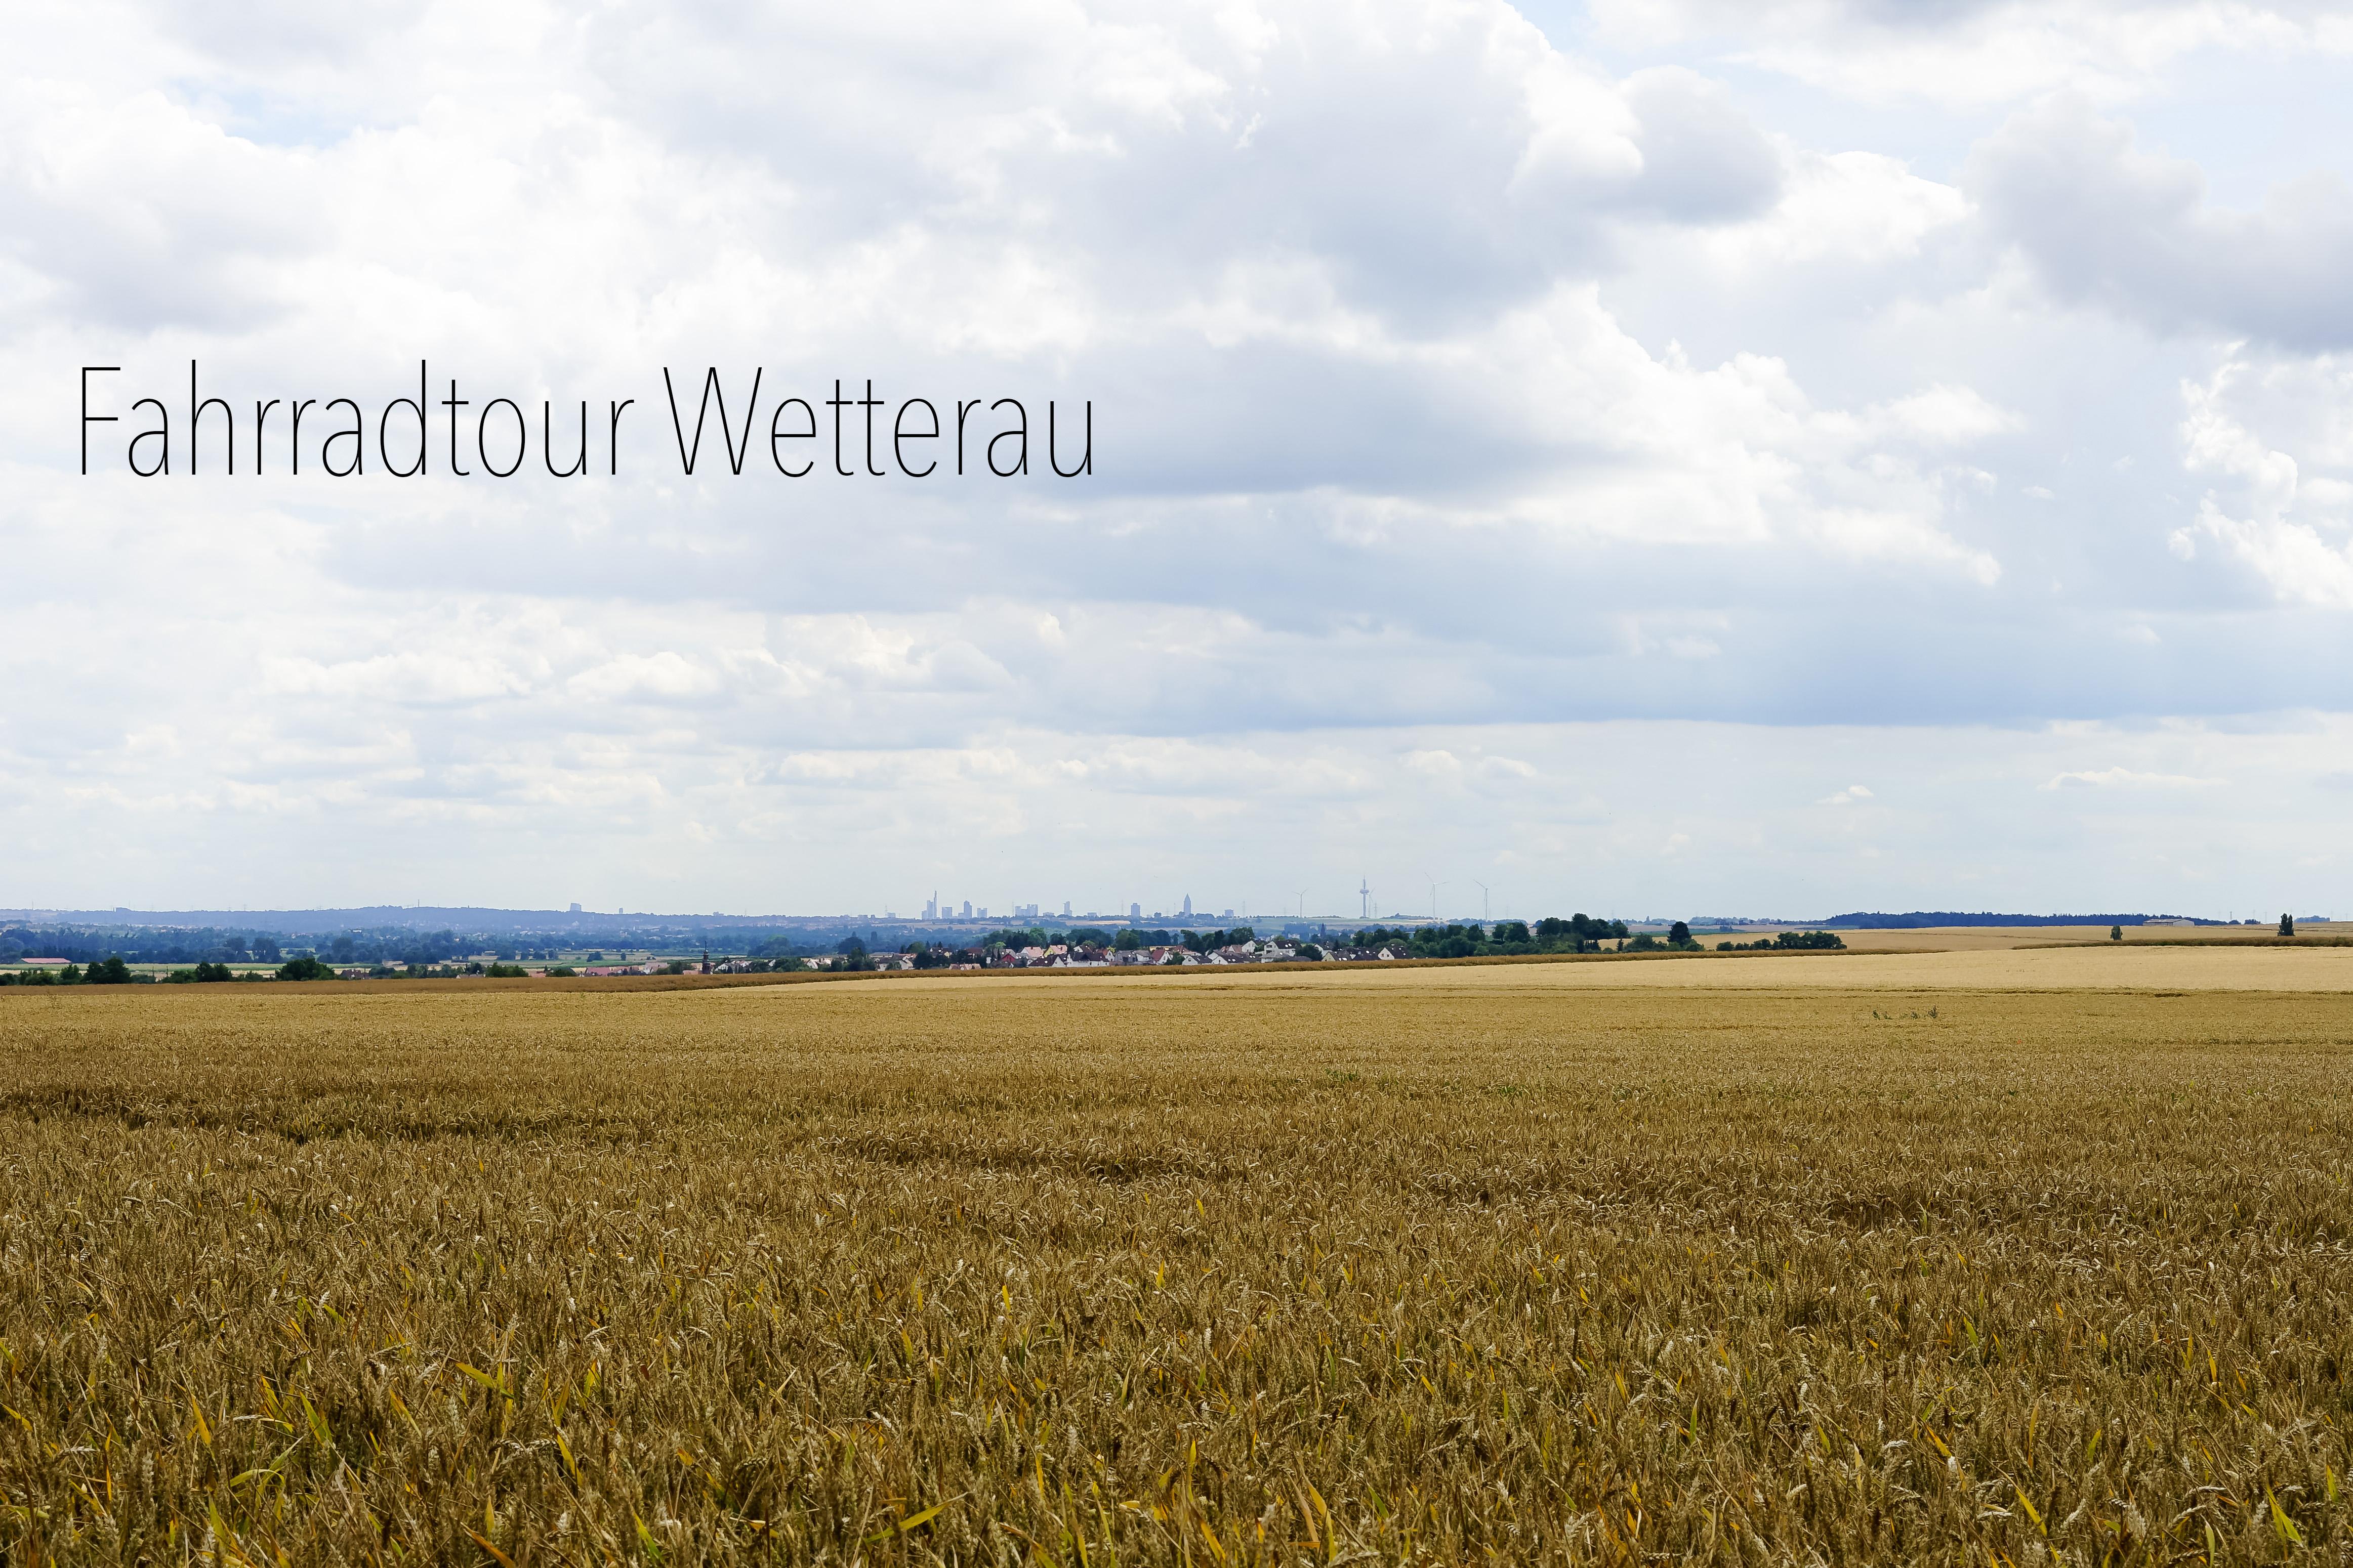 Fahrradtour Wetterau - Wunderbrunnen - Foodblog - Fotografie